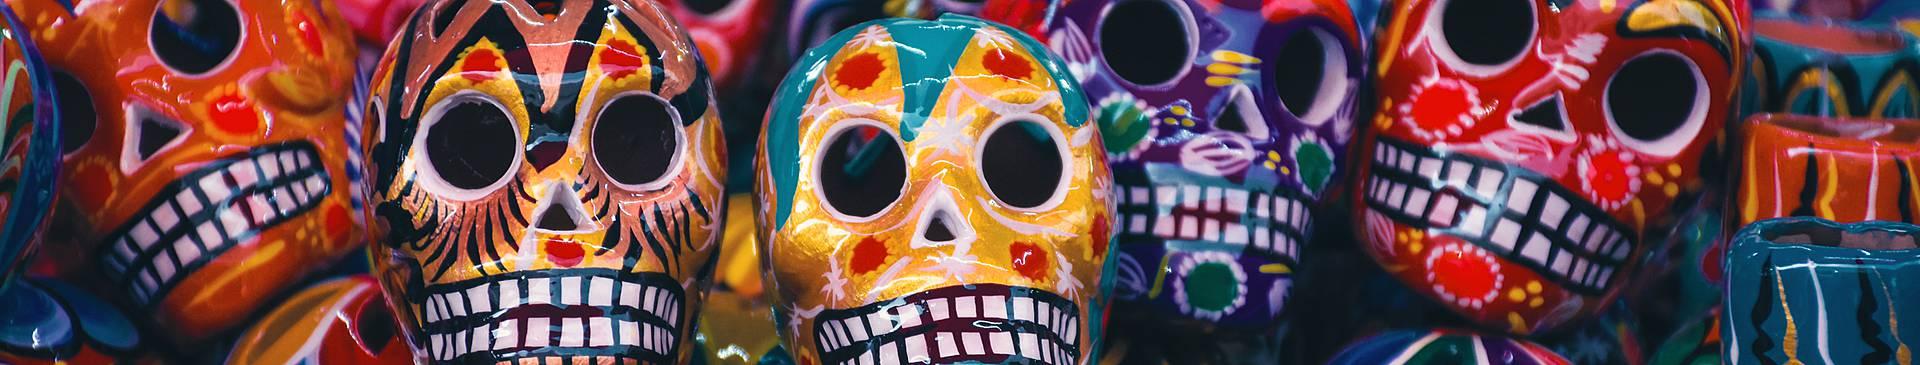 Viajes a México en otoño